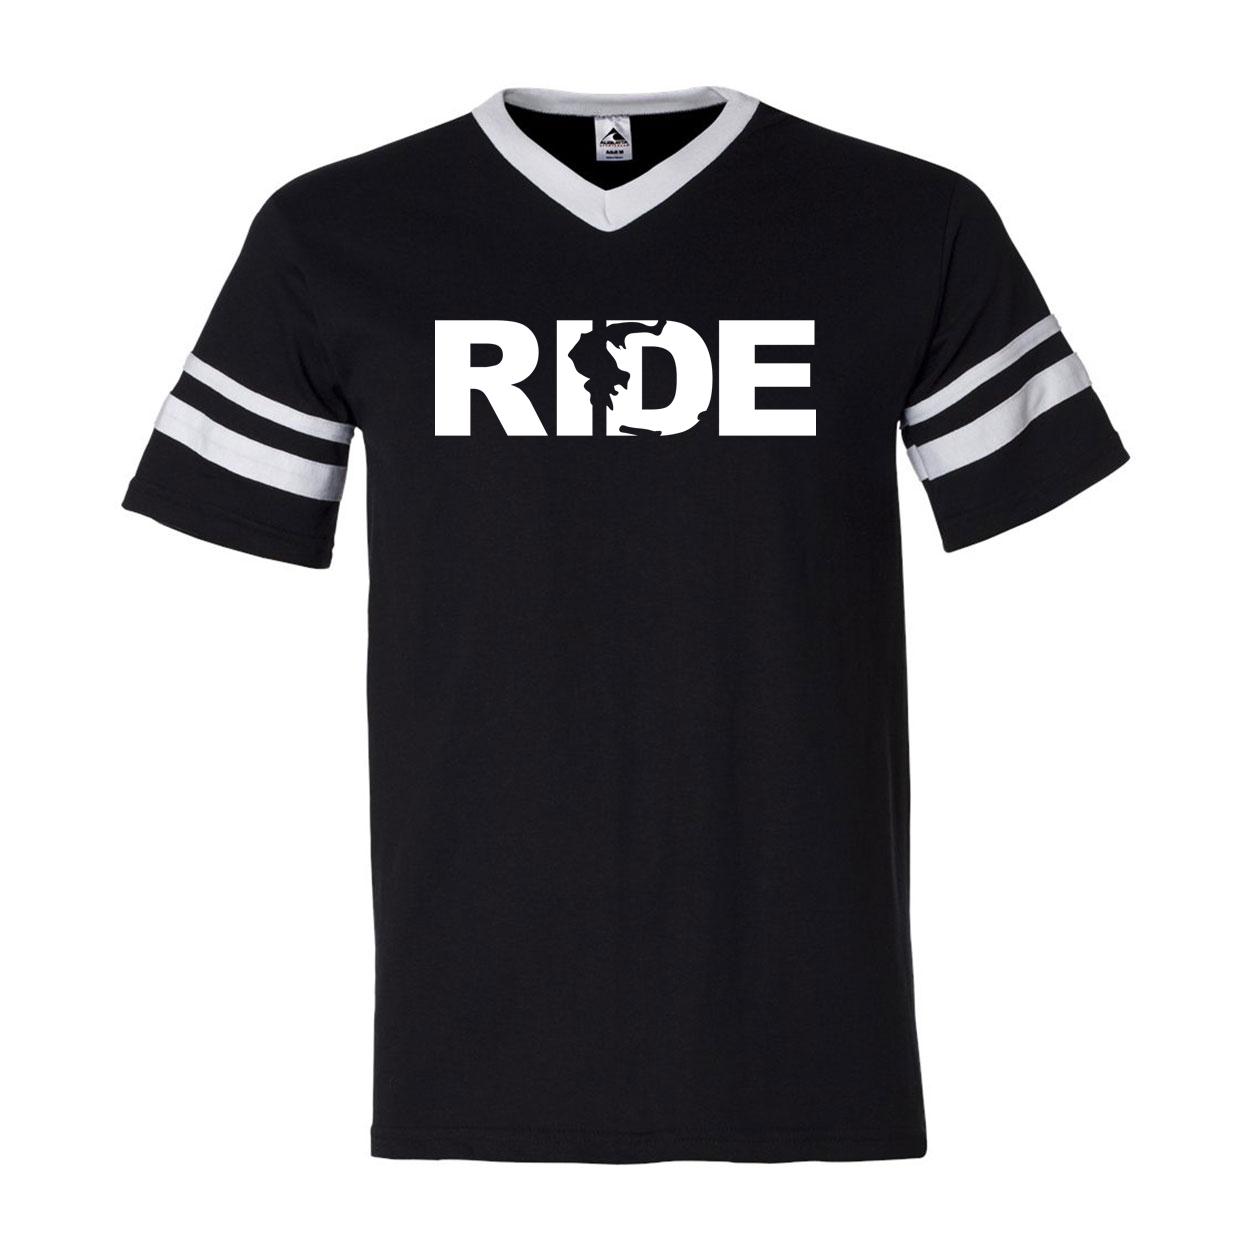 Ride Greece Classic Premium Striped Jersey T-Shirt Black/White (White Logo)